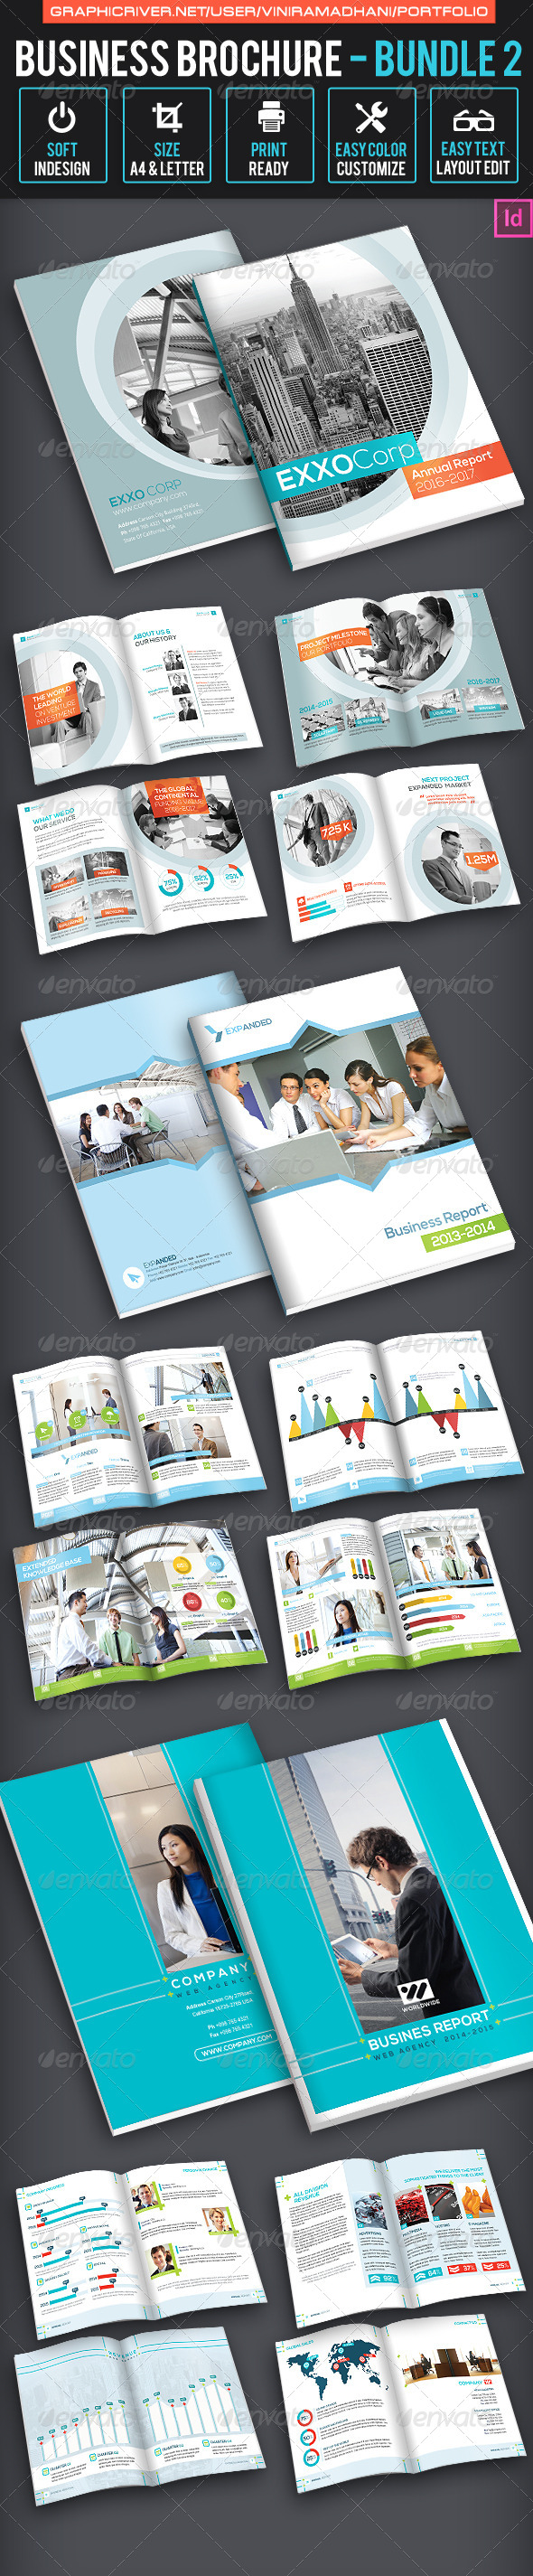 GraphicRiver Business Brochure Bundle 2 7094950